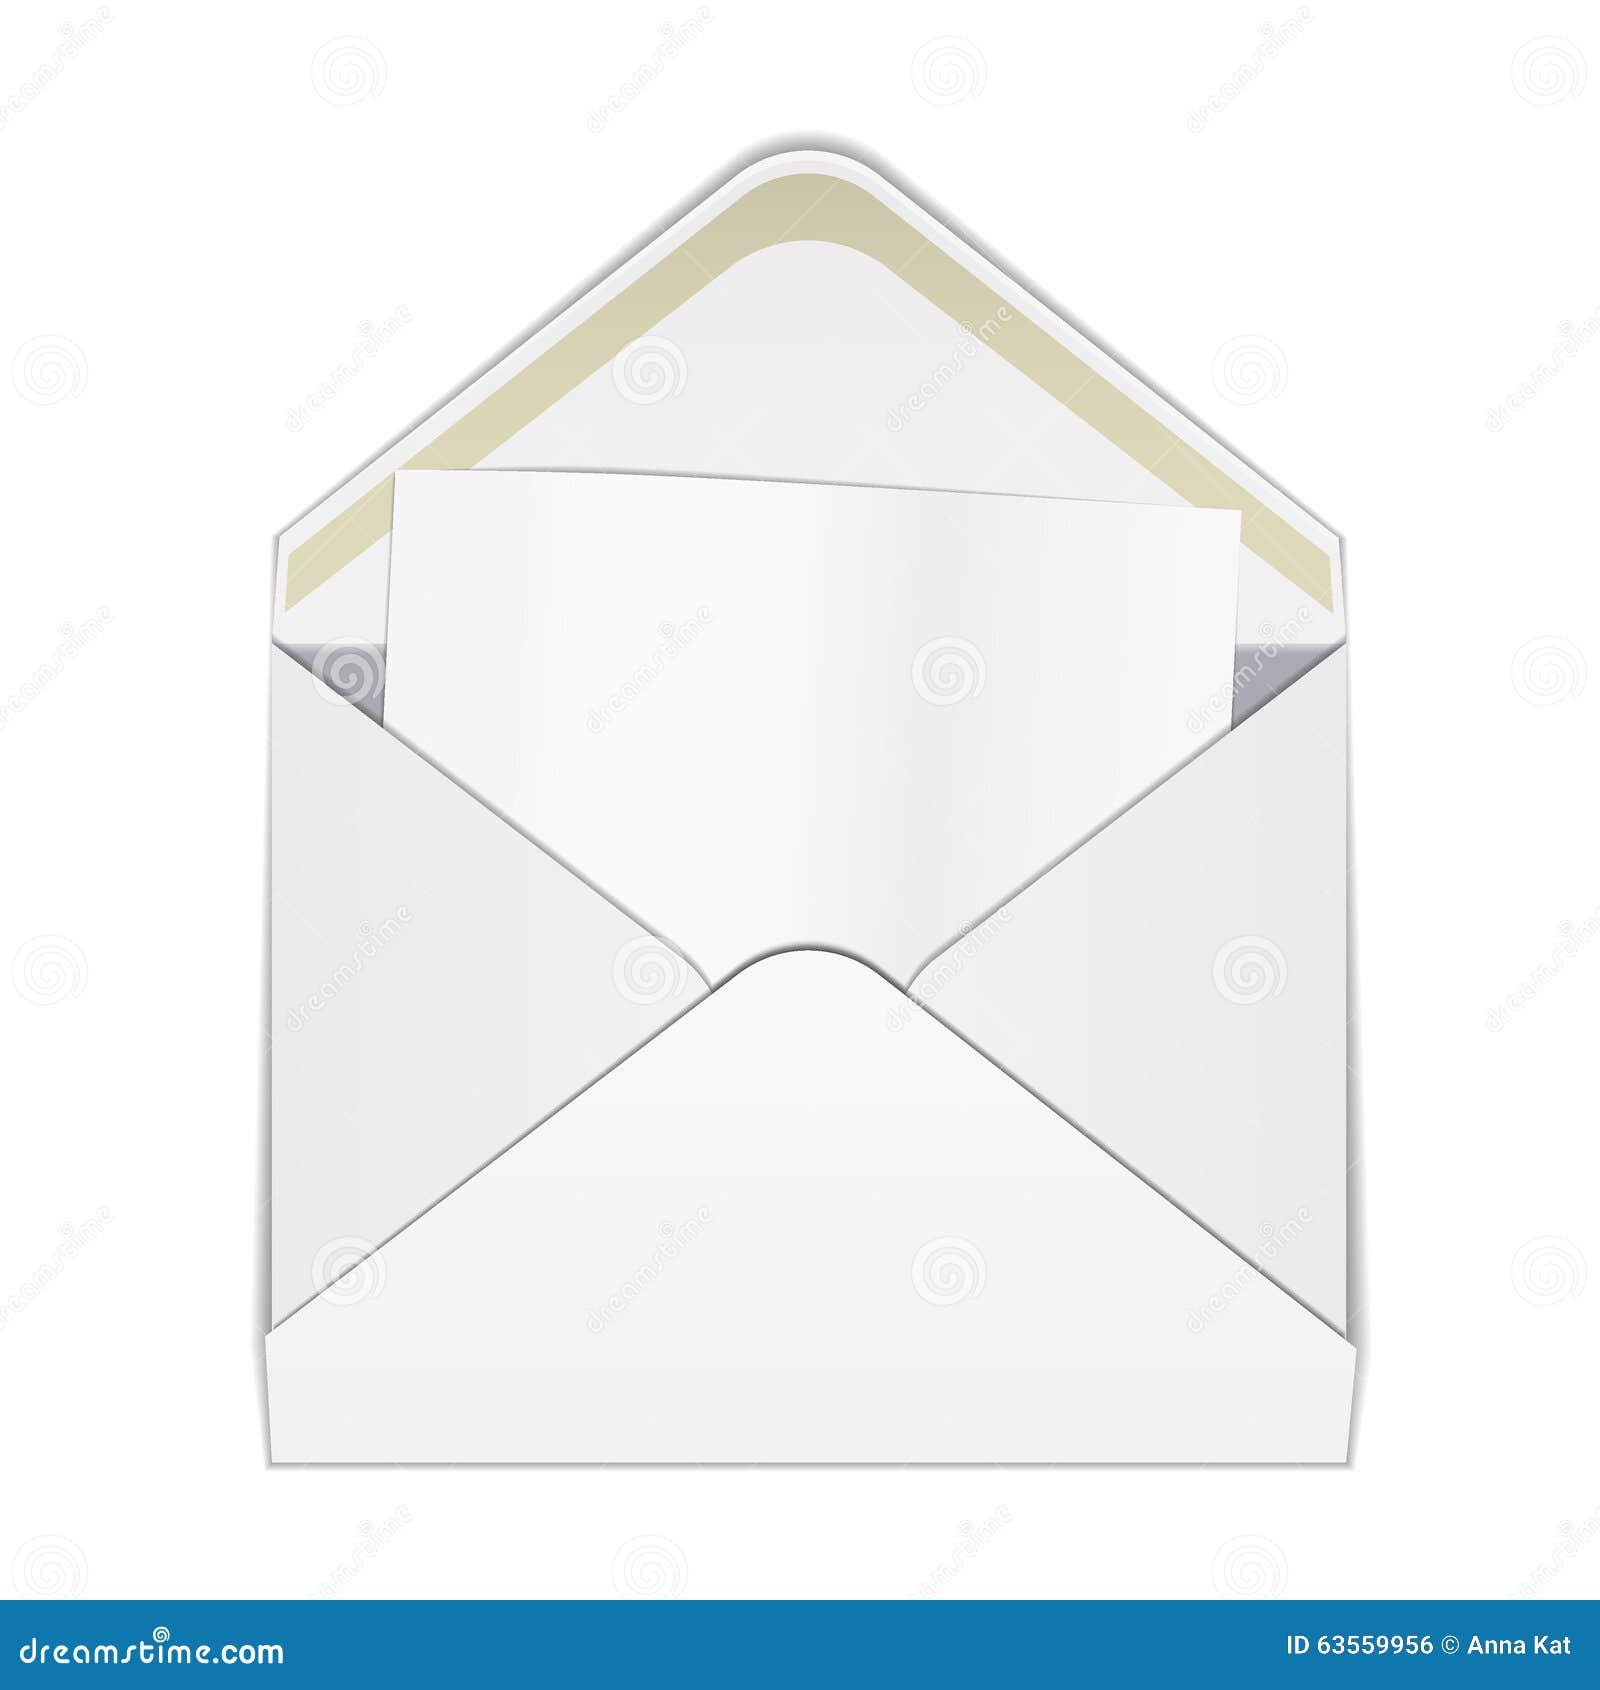 envelope fold template 1 stock vector illustration of frame 63559956